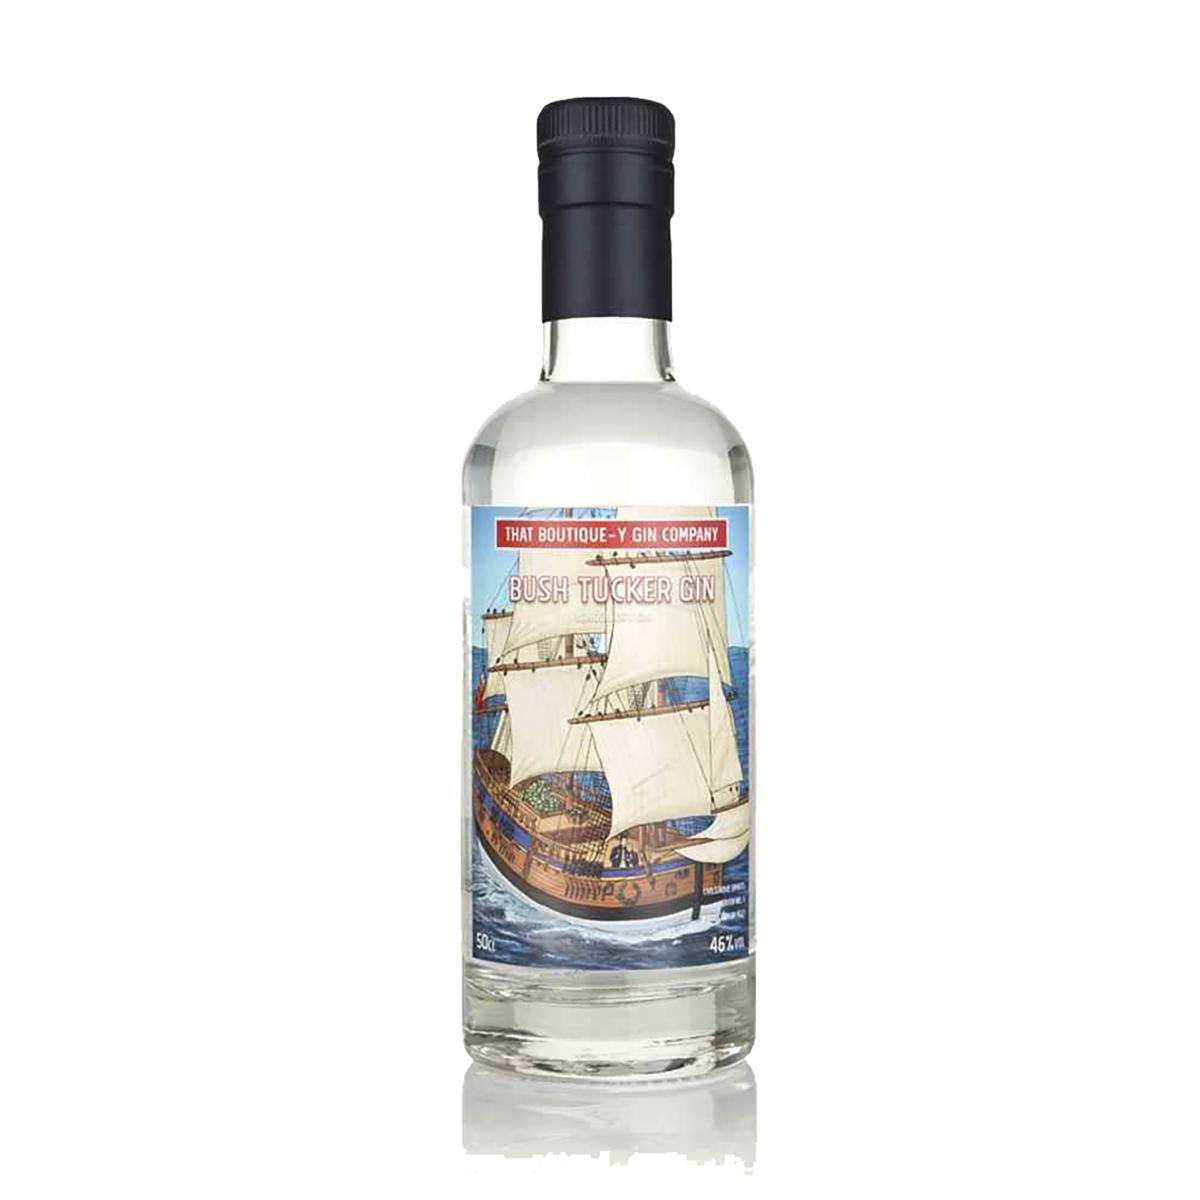 Bush Tucker Gin - Chilgrove Spirits | That Boutique-Y